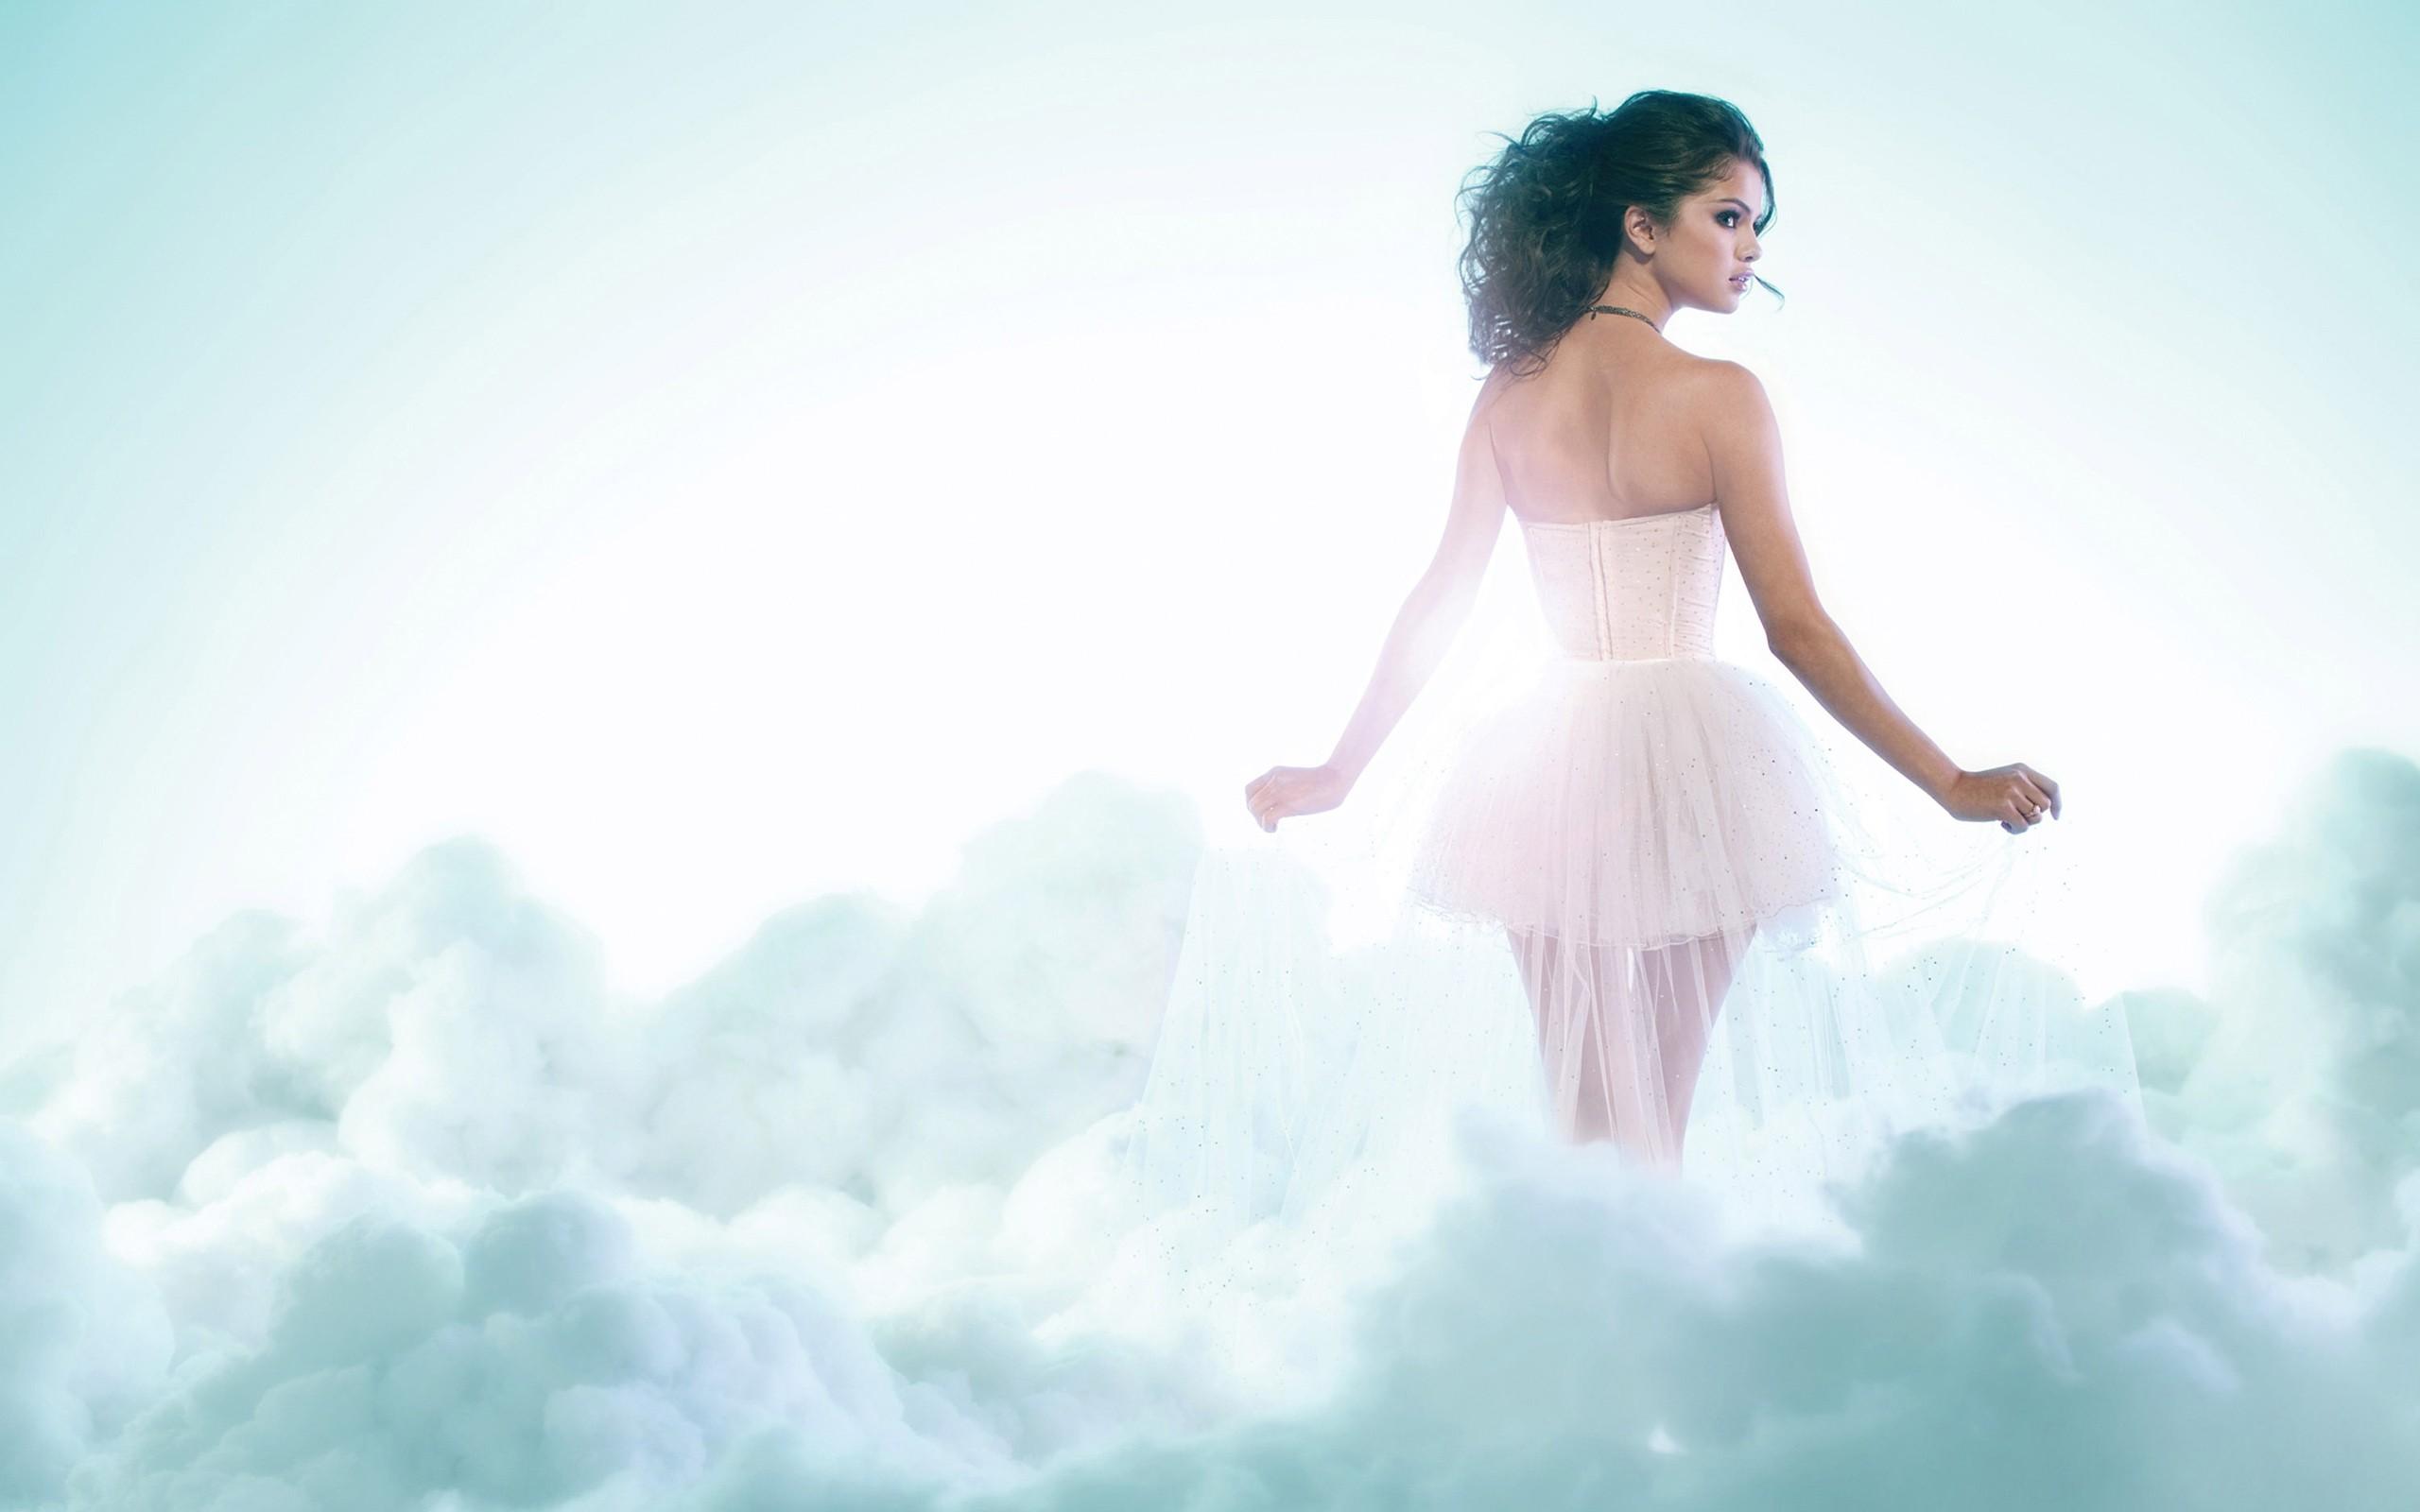 Selena Gomez Wallpaper Background 35180 2560x1600